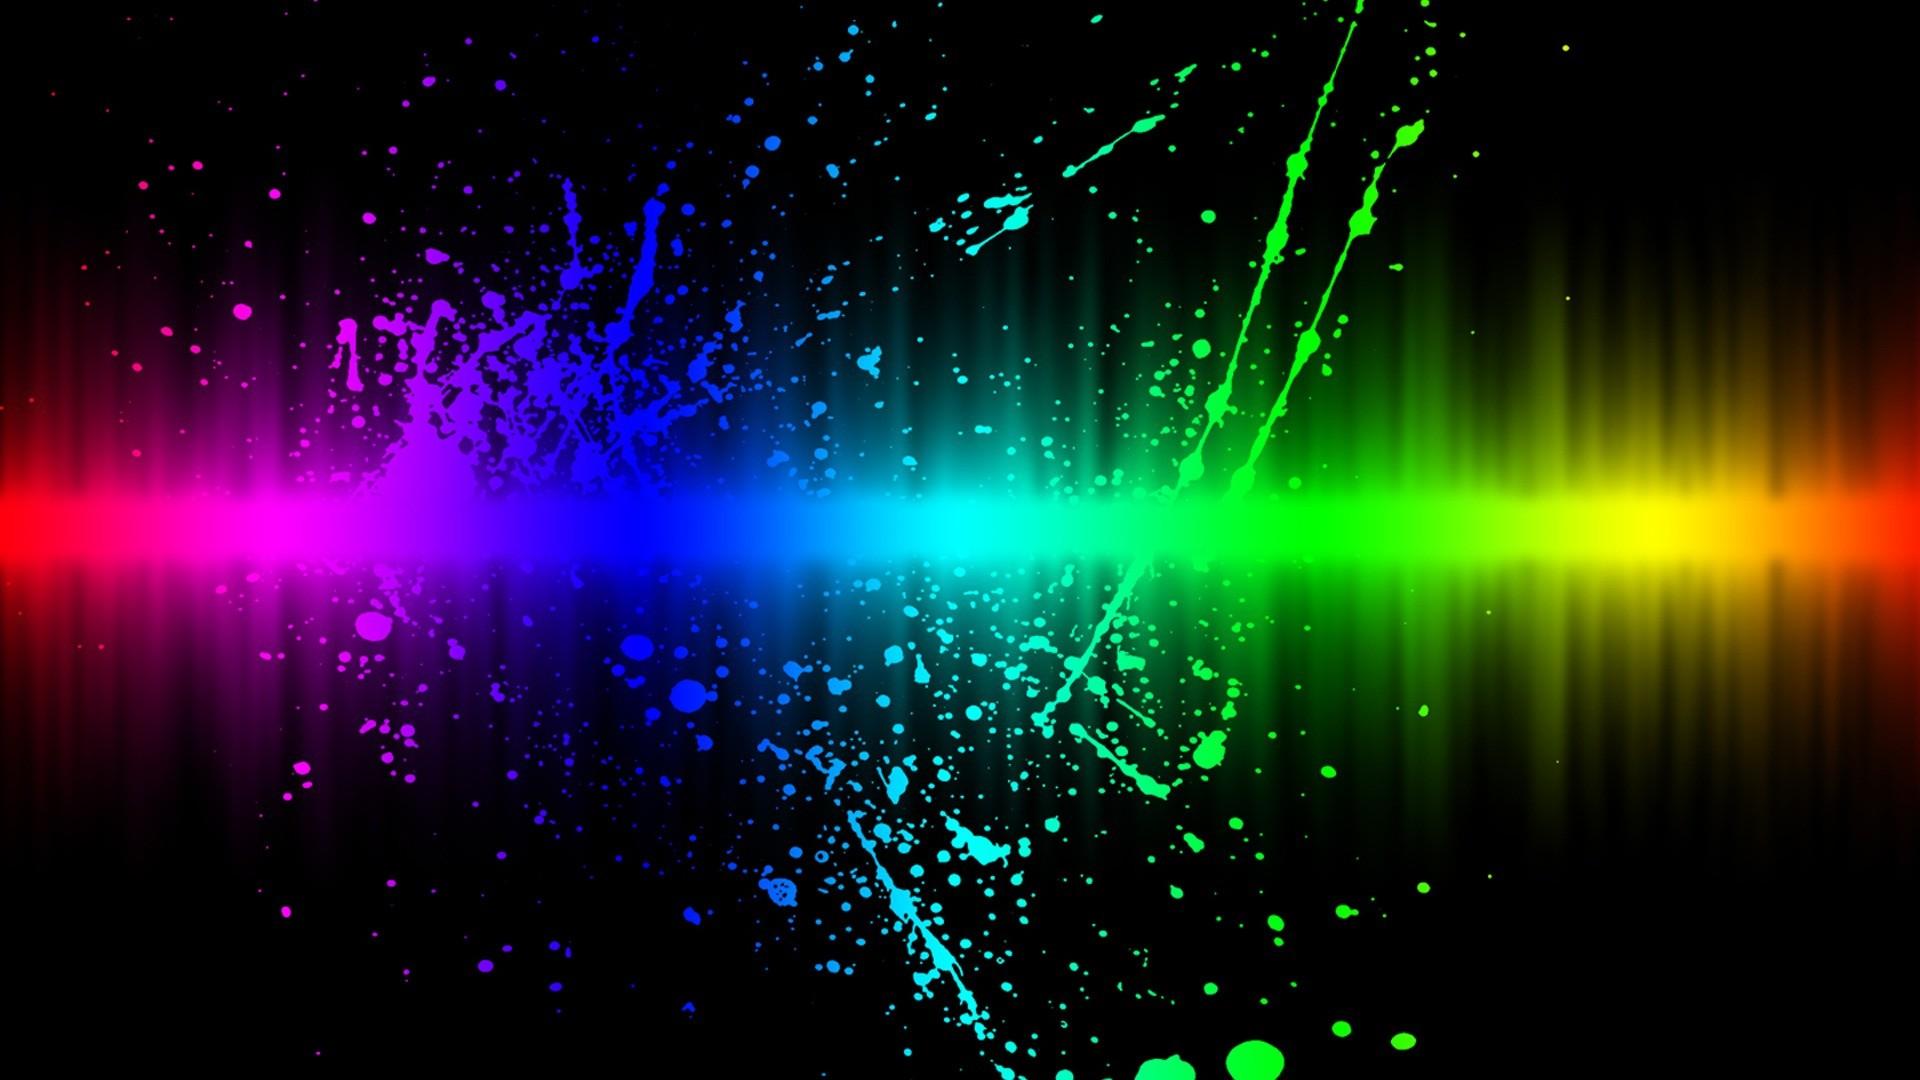 neon light wallpaper ·①